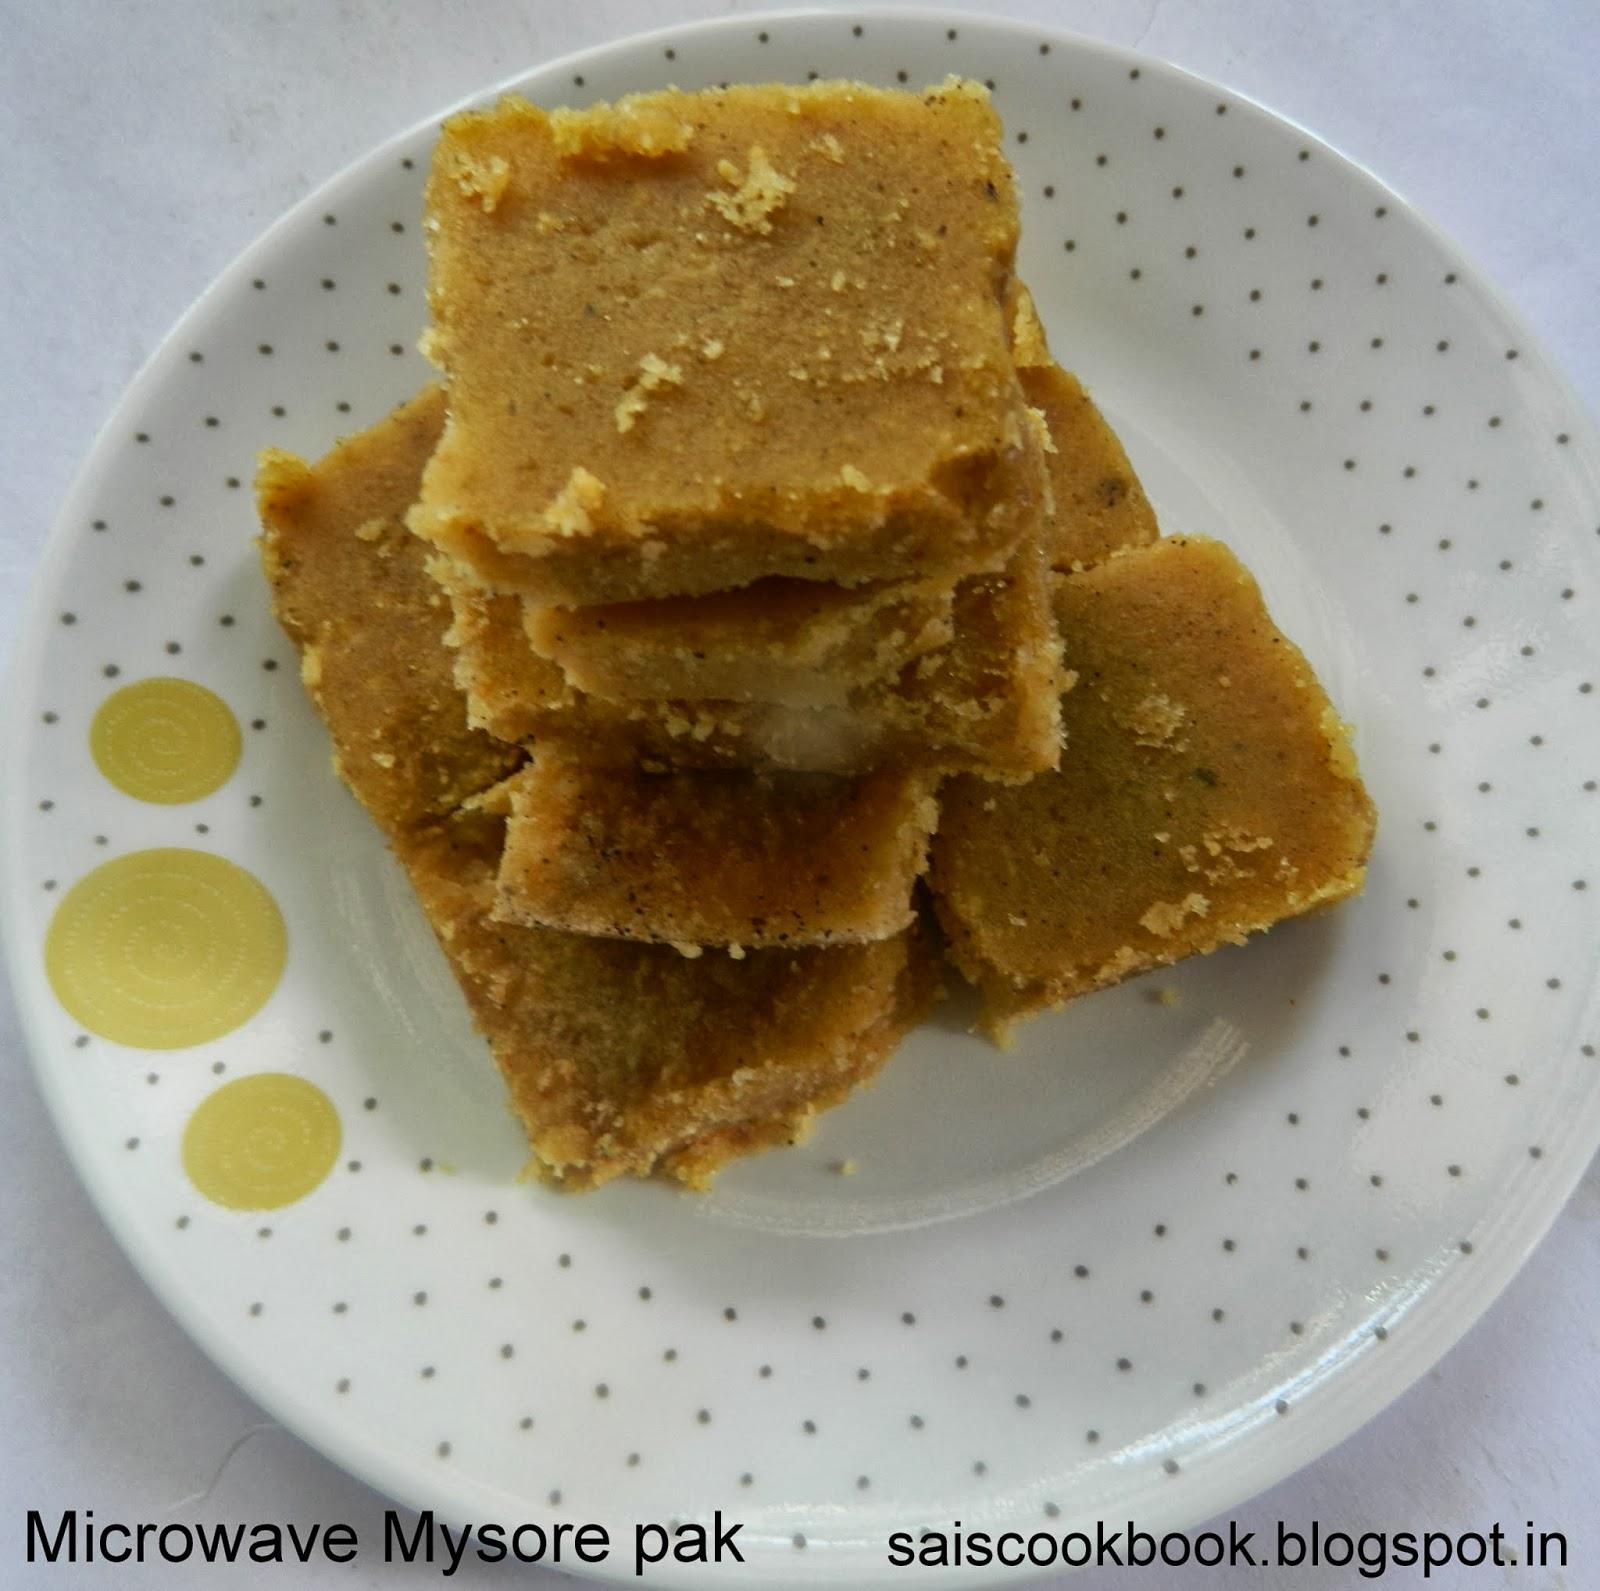 Mysore Pak Recipe In Microwave Oven: Geeths Dawath : Microwave Mysore Pak